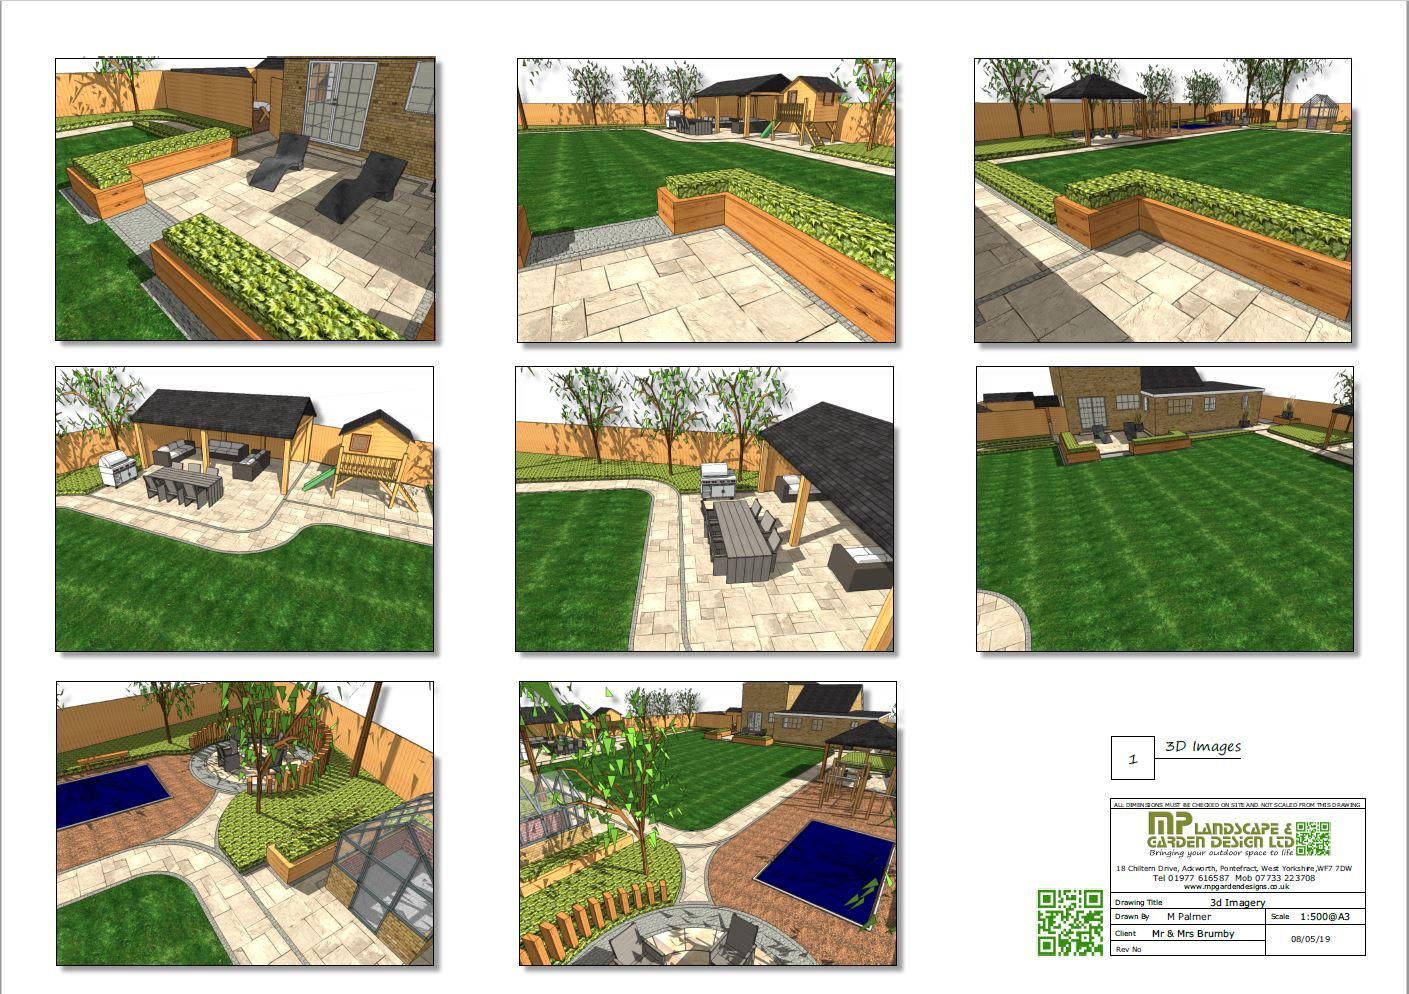 1,Garden layout plans-3D images for a rear garden in Darrington